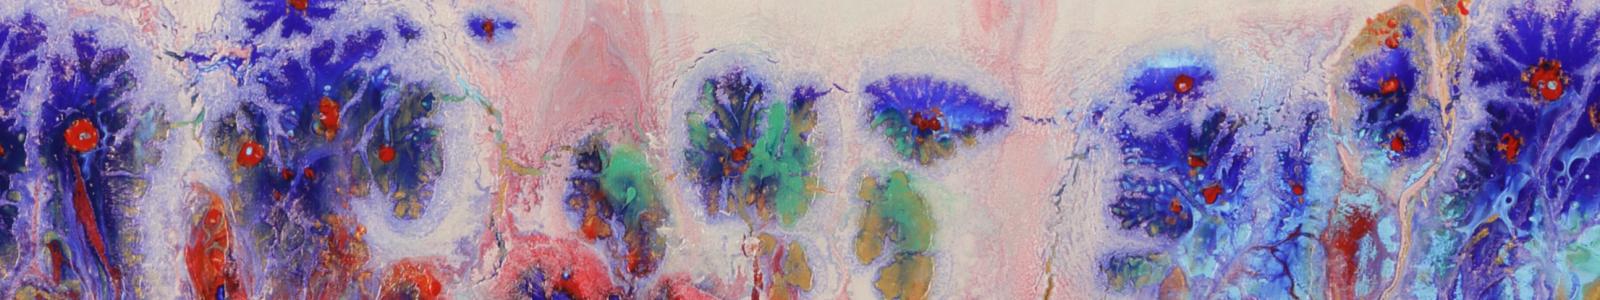 Gallery Painter Elena Smal